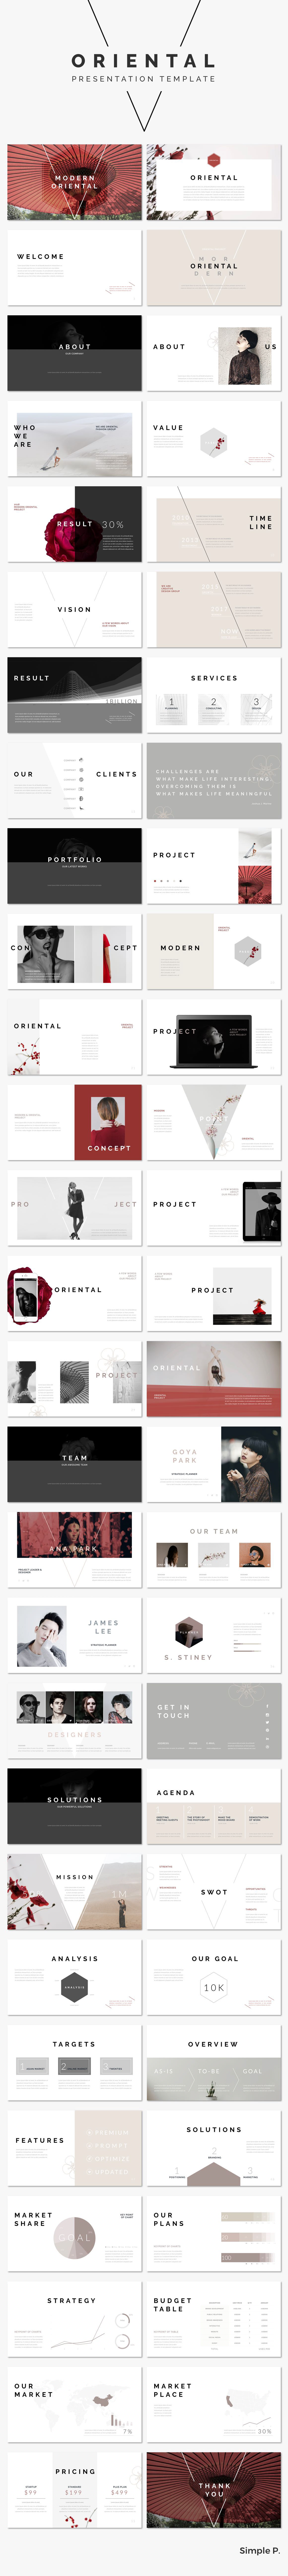 oriental presentation template on behance